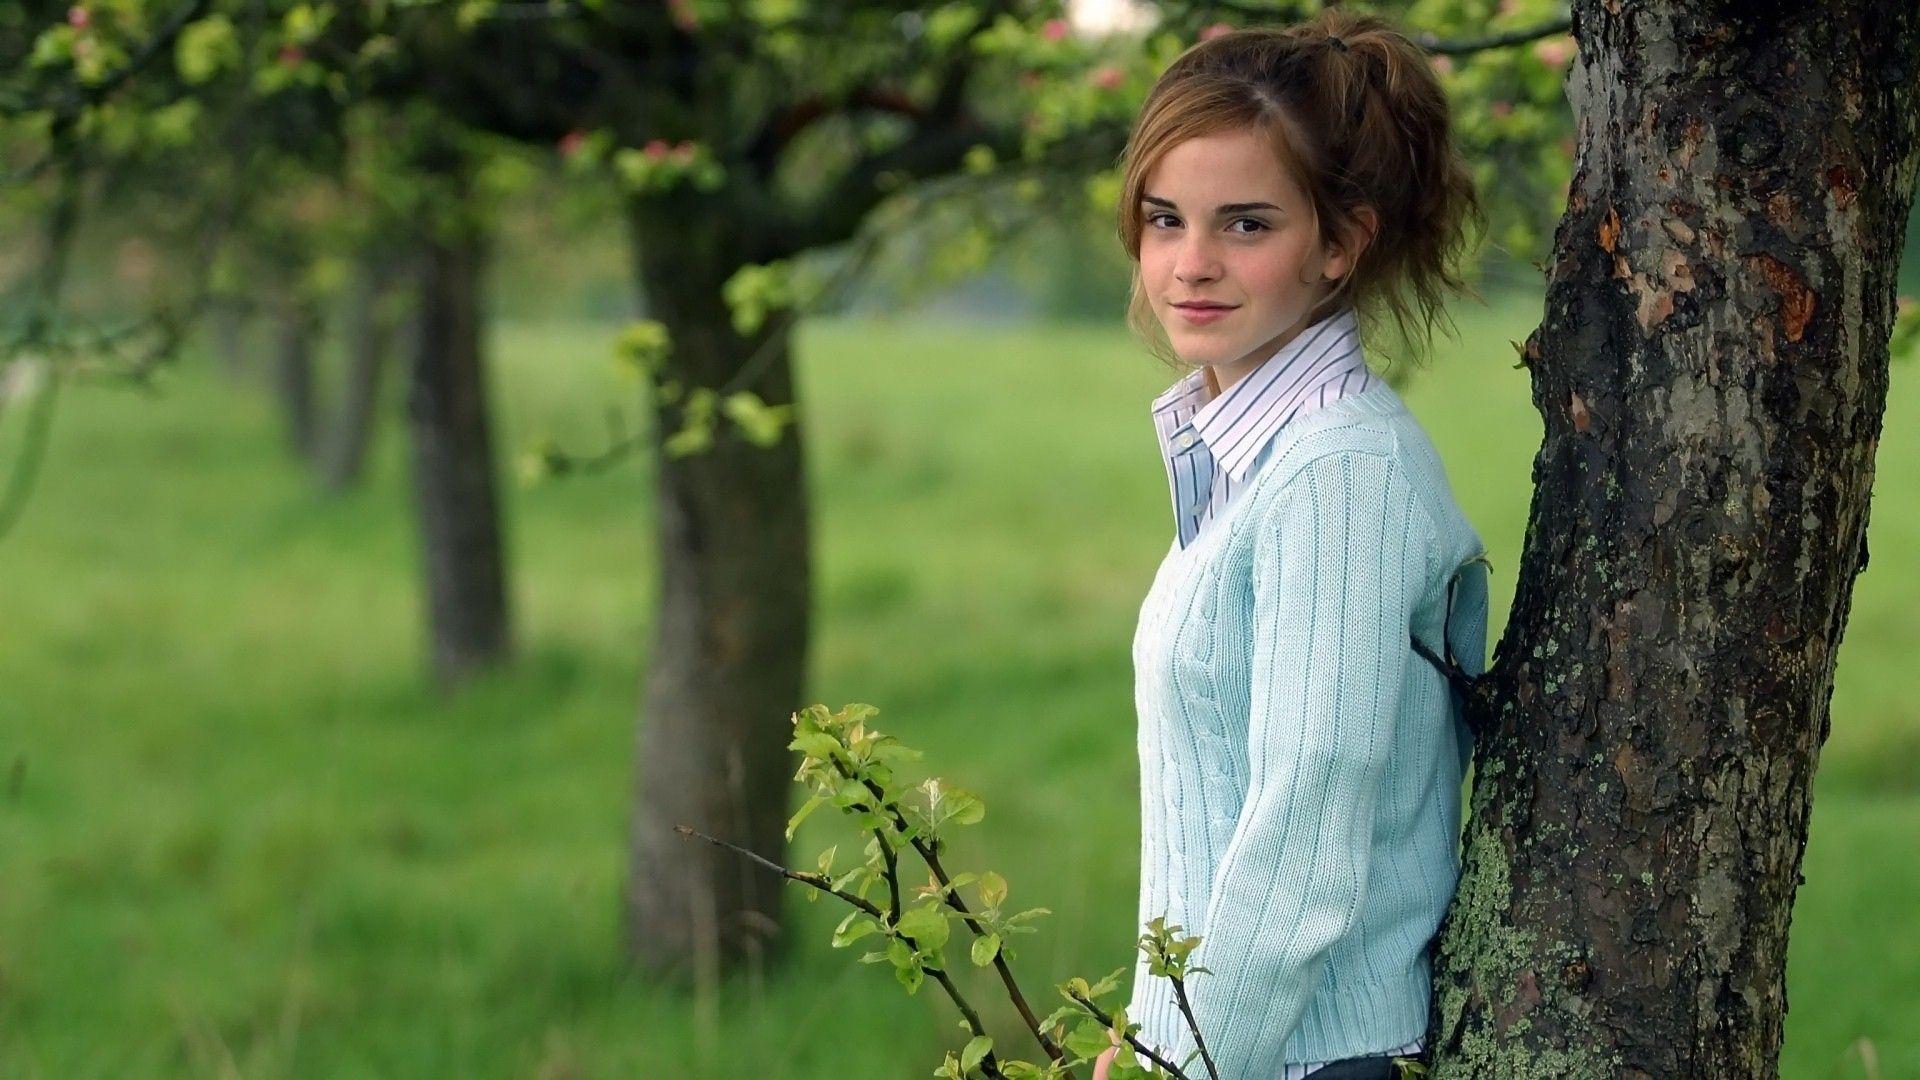 Emma Watson Wallpapers | Free Download HD Hot Beautiful Actress Images